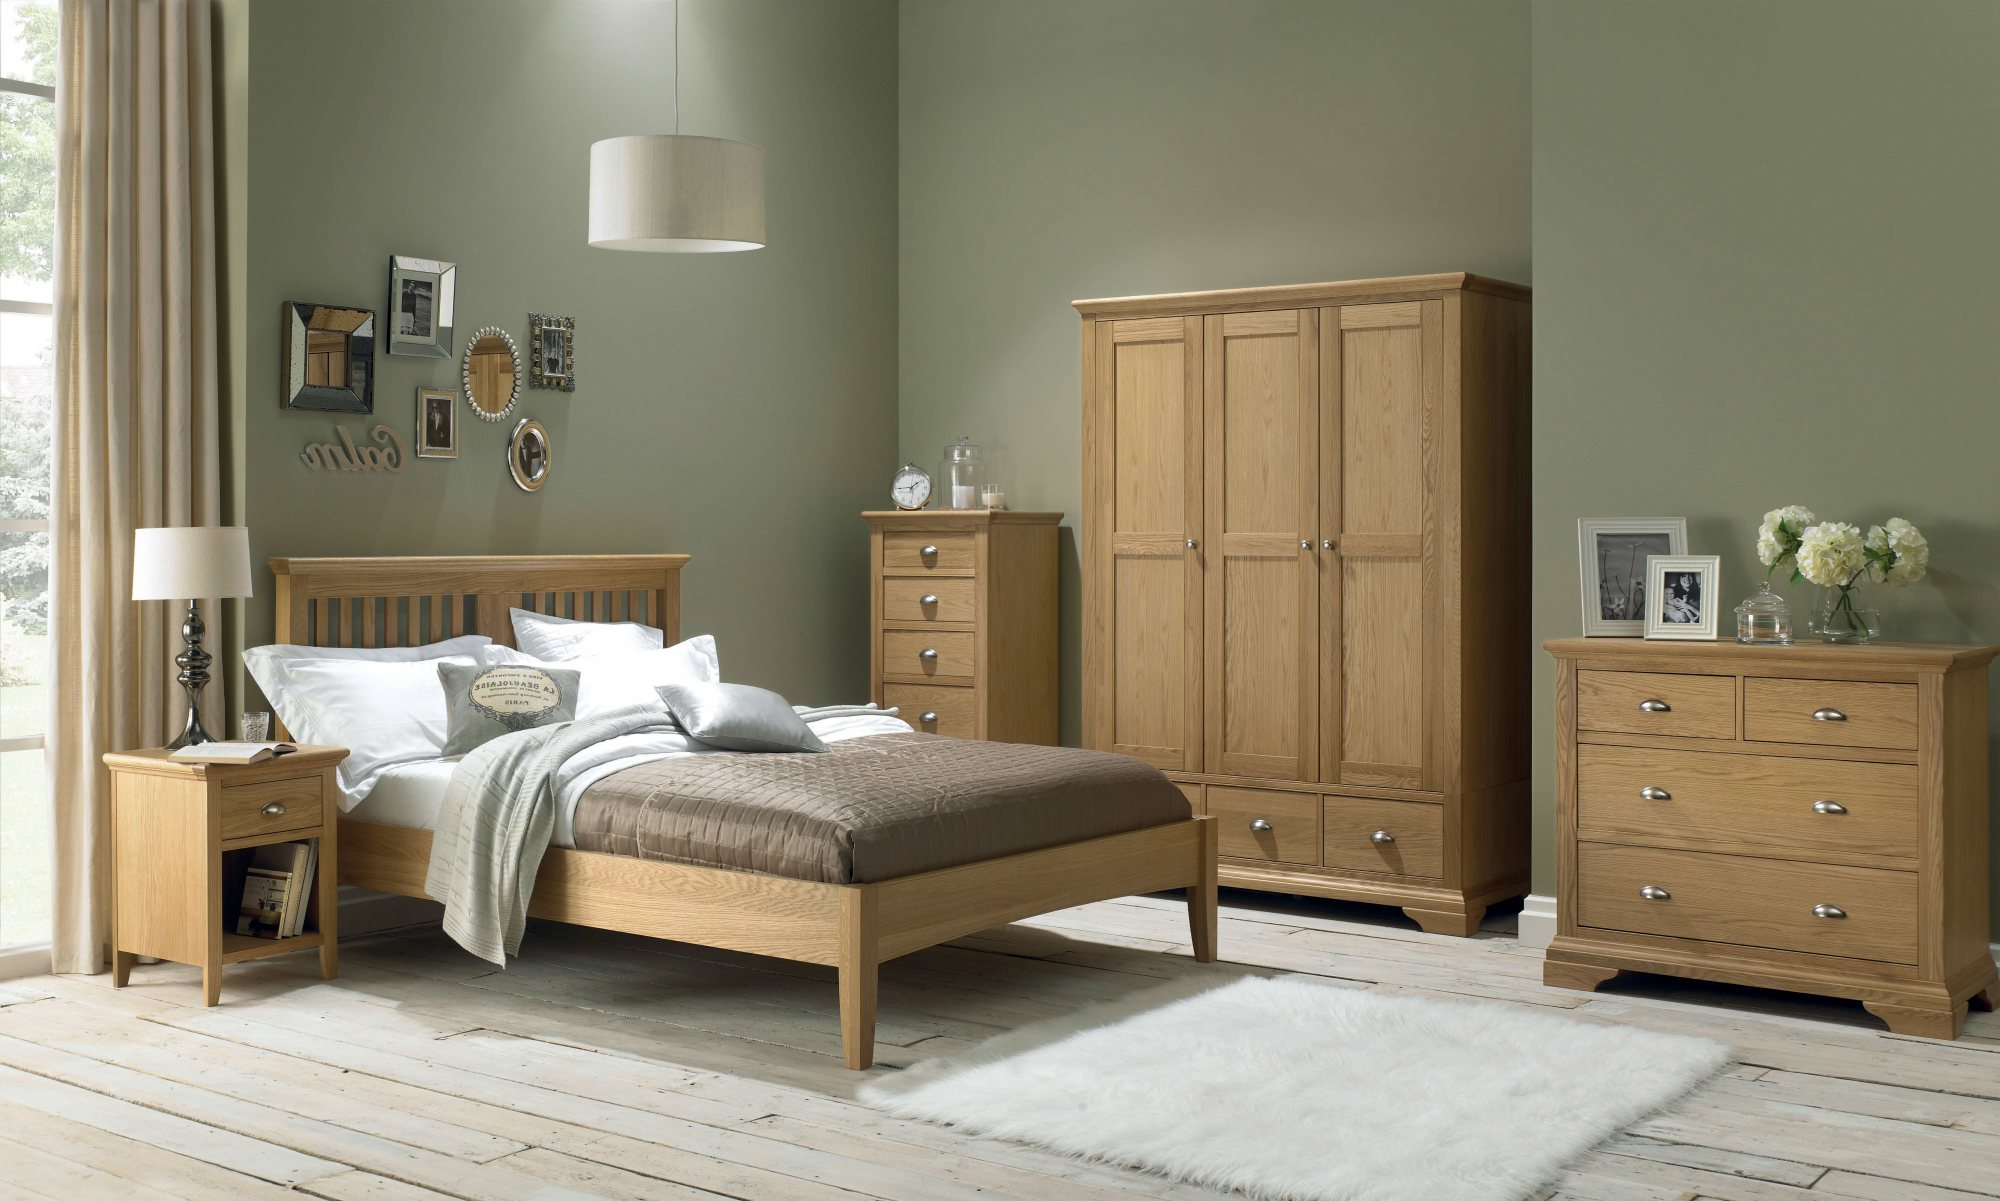 KYRA BEDSIDE NIGHTSTAND BEDROOM SETTING